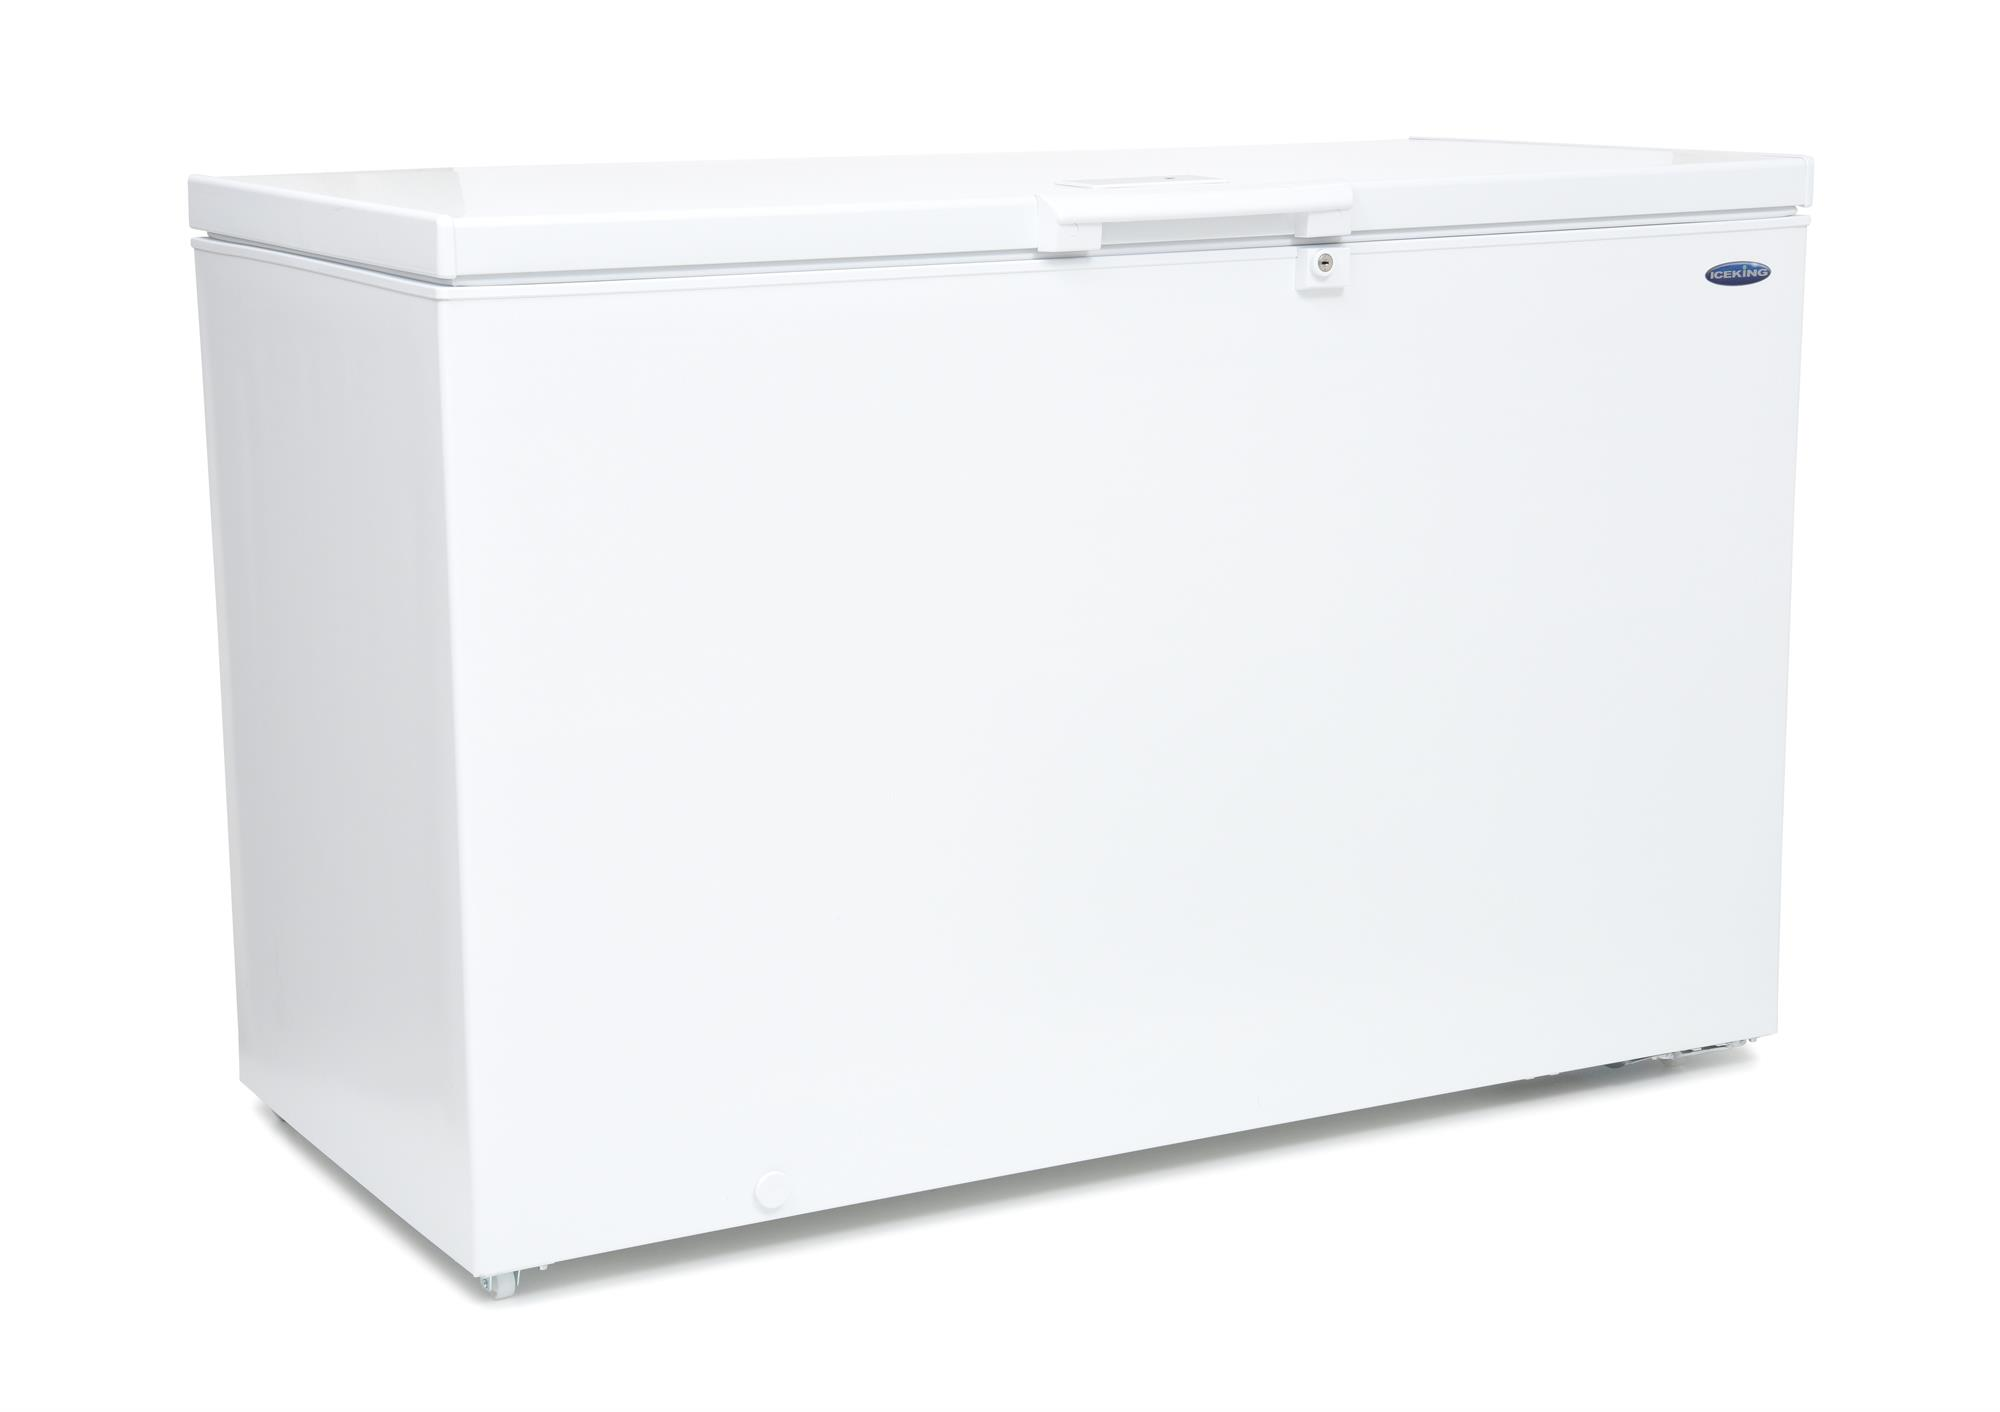 Iceking Cf390w 390 Litre Capacity Large Chest Freezer